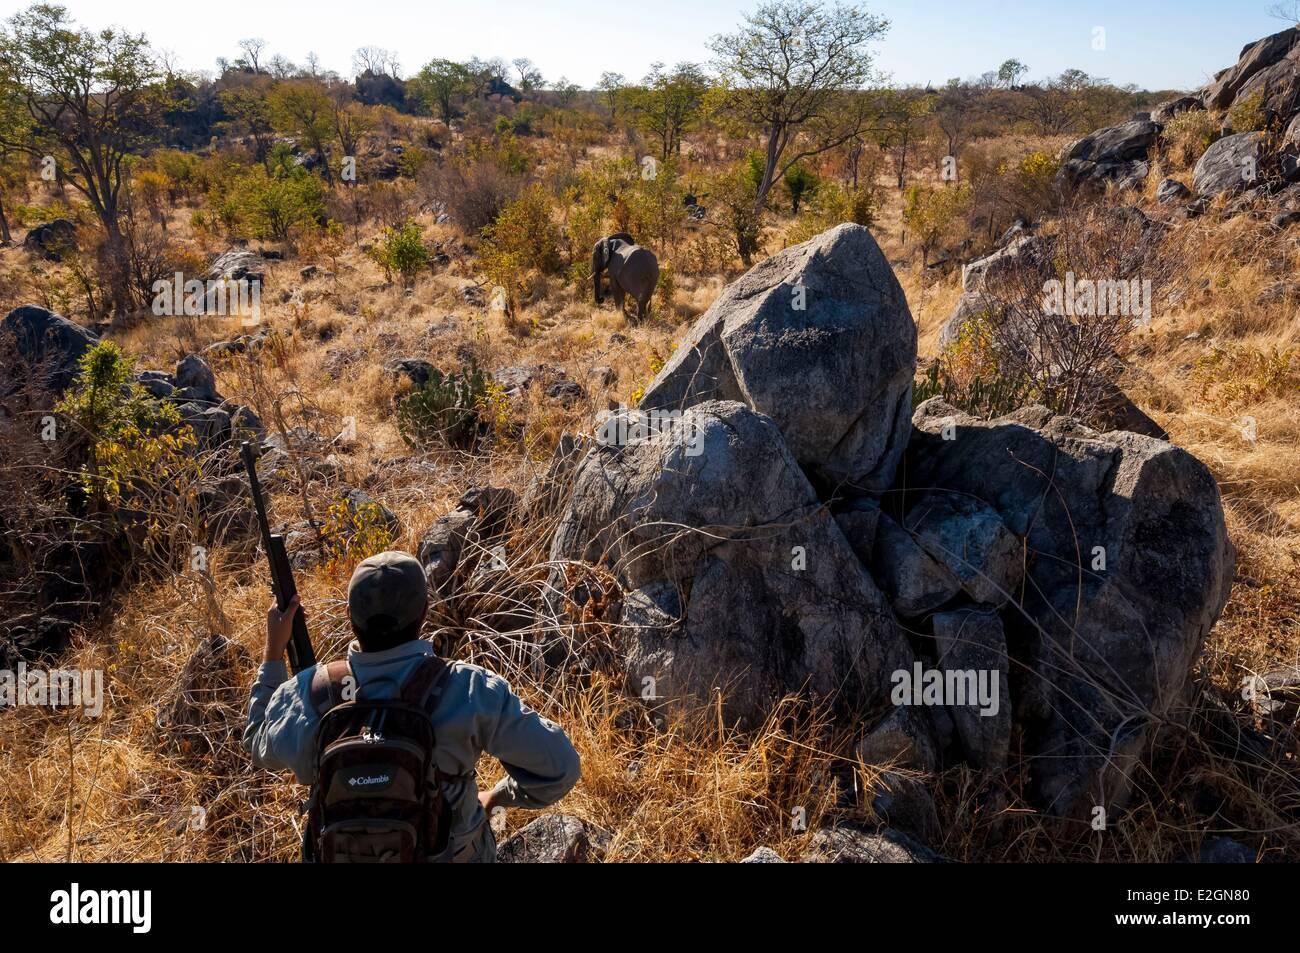 Zimbabwe Matabeleland North Province Hwange National Park Shuba Plains Camp Hwange walking safari with armed guide Stock Photo